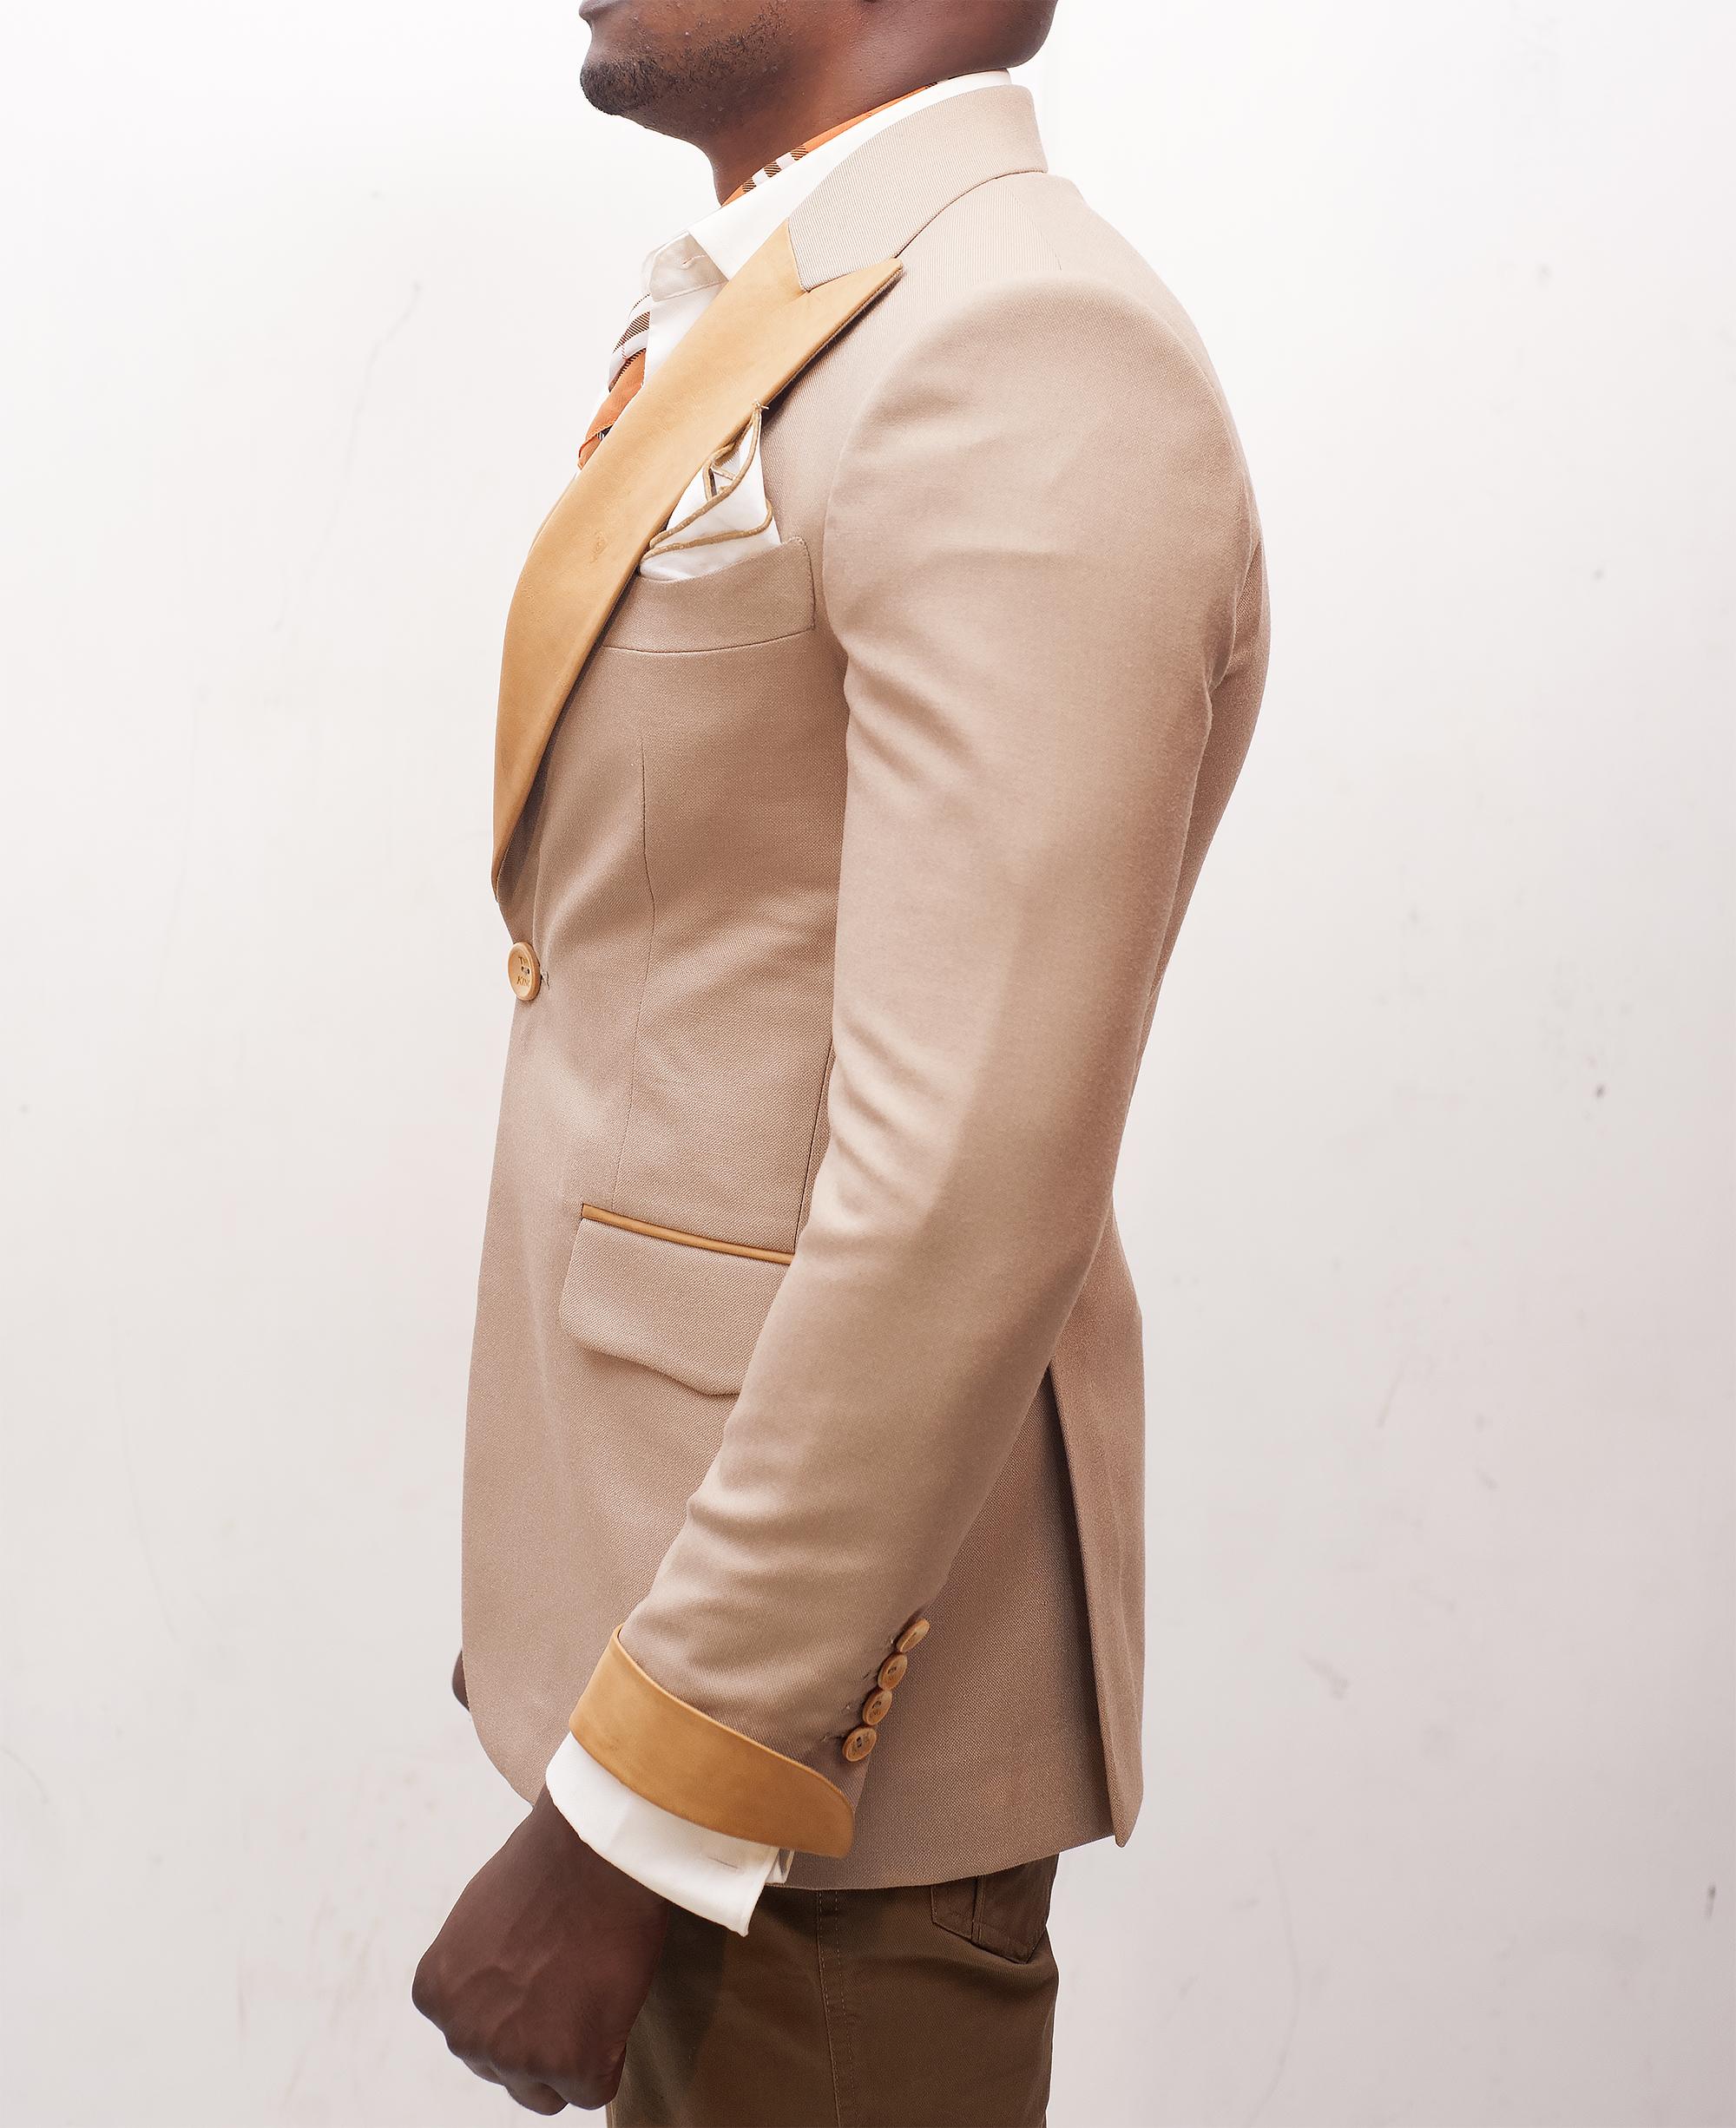 Unique beige wedding tuxedo in Nairobi Kenya beige side view